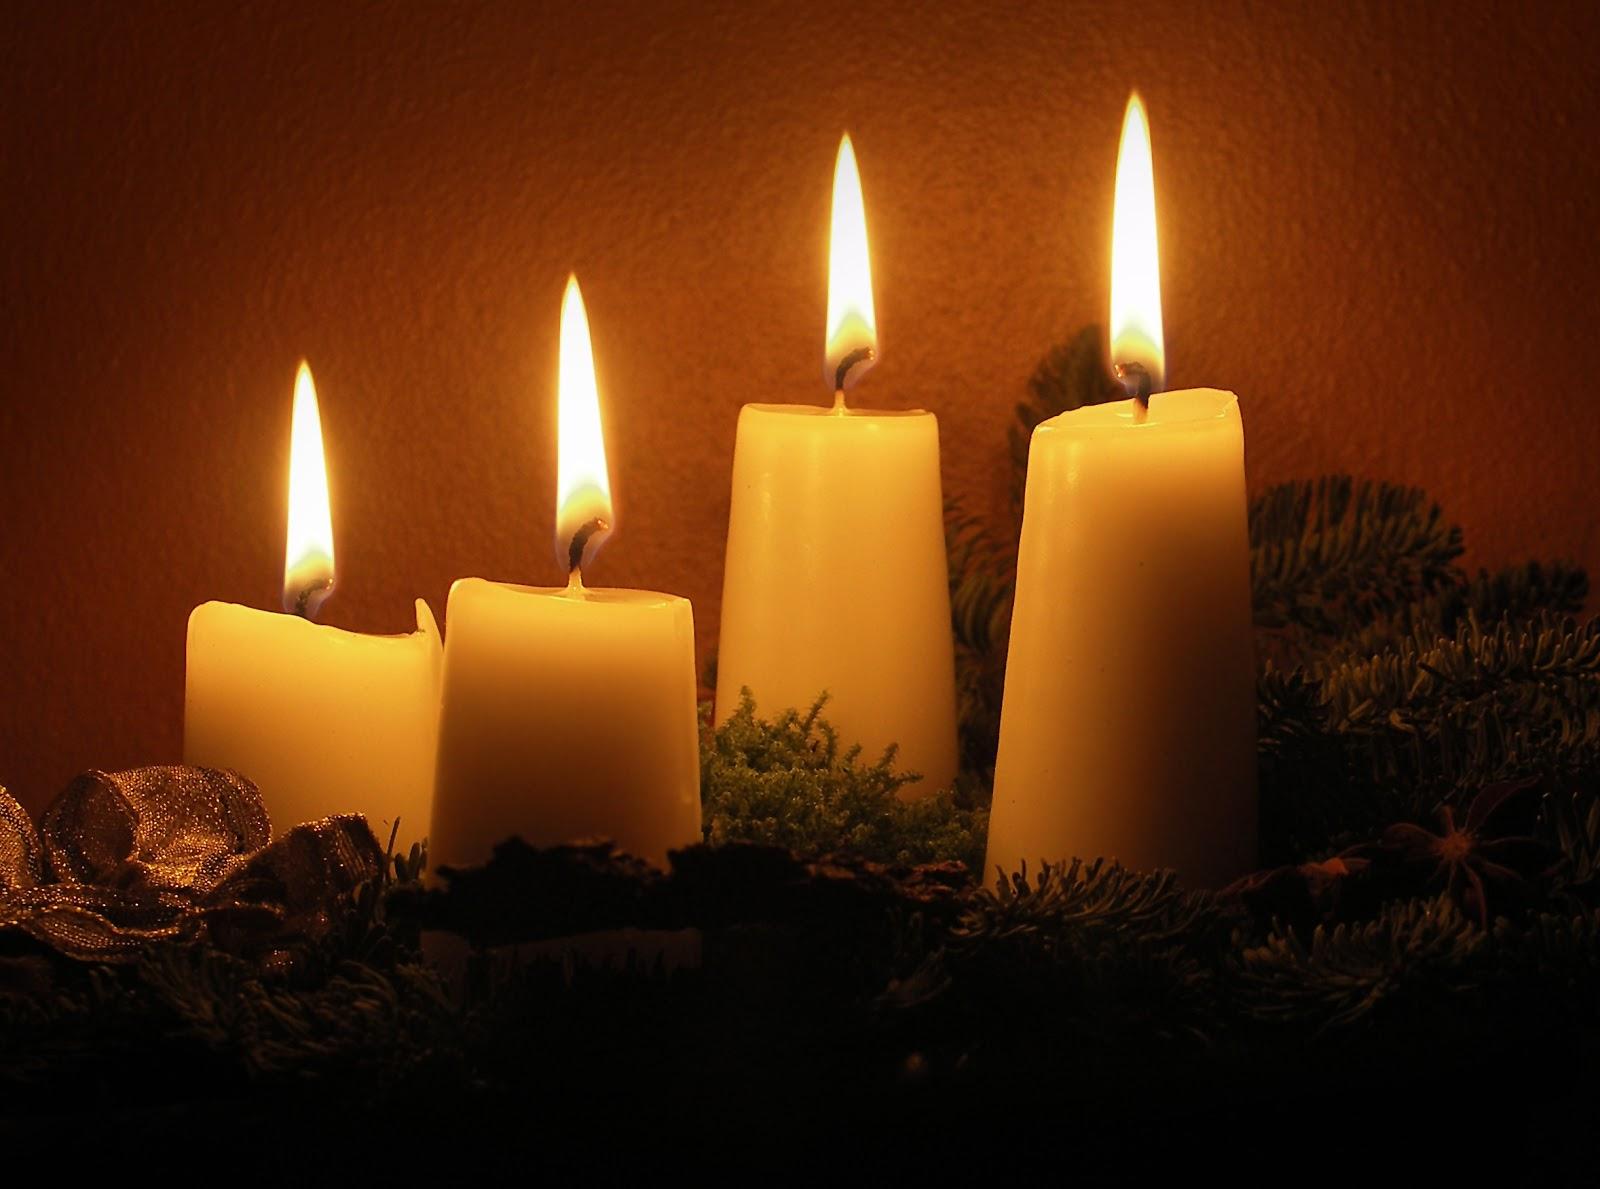 Fall Candles Wallpaper 마리아사랑넷 대림초 Advent Candle